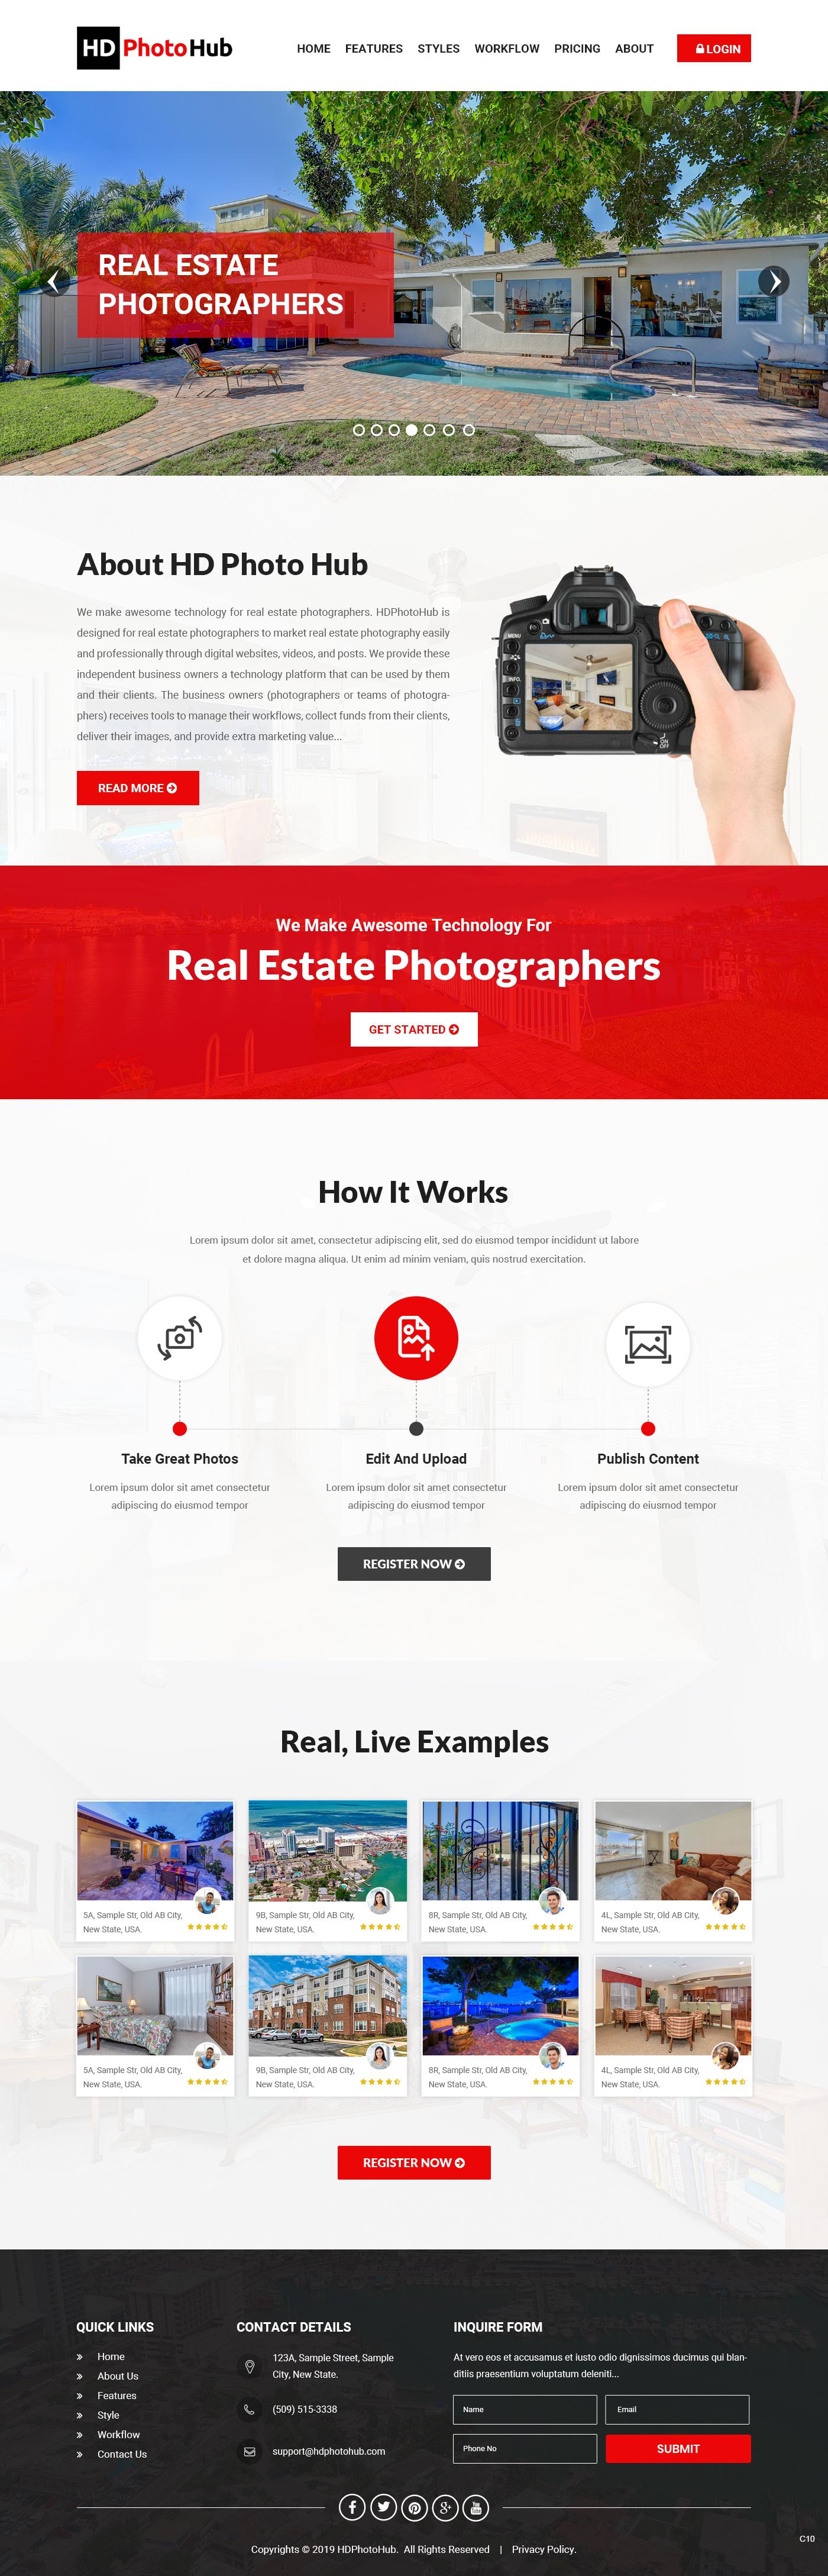 Participating Entry #4 for Website Design contest - Single Real Estate Property Listing Website Template - original